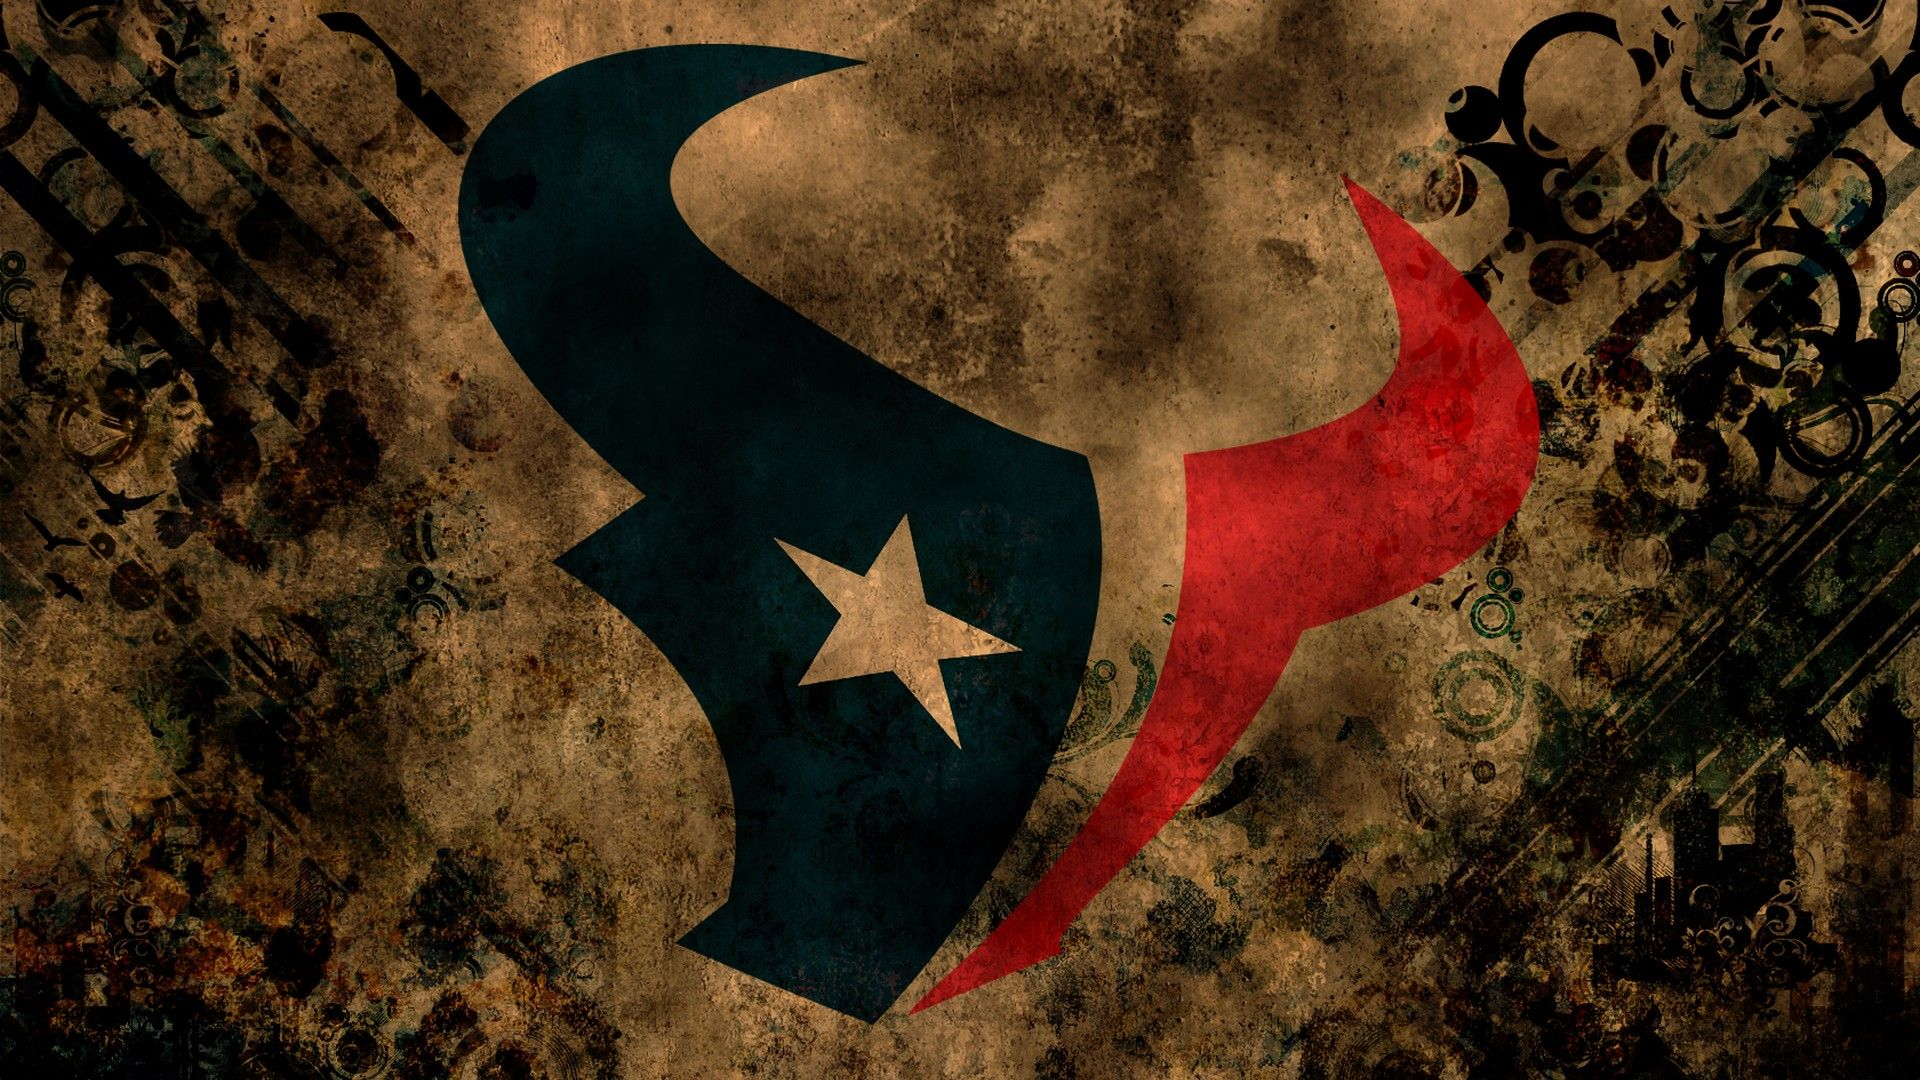 Wallpapers Houston Texans Houston texans, Texans